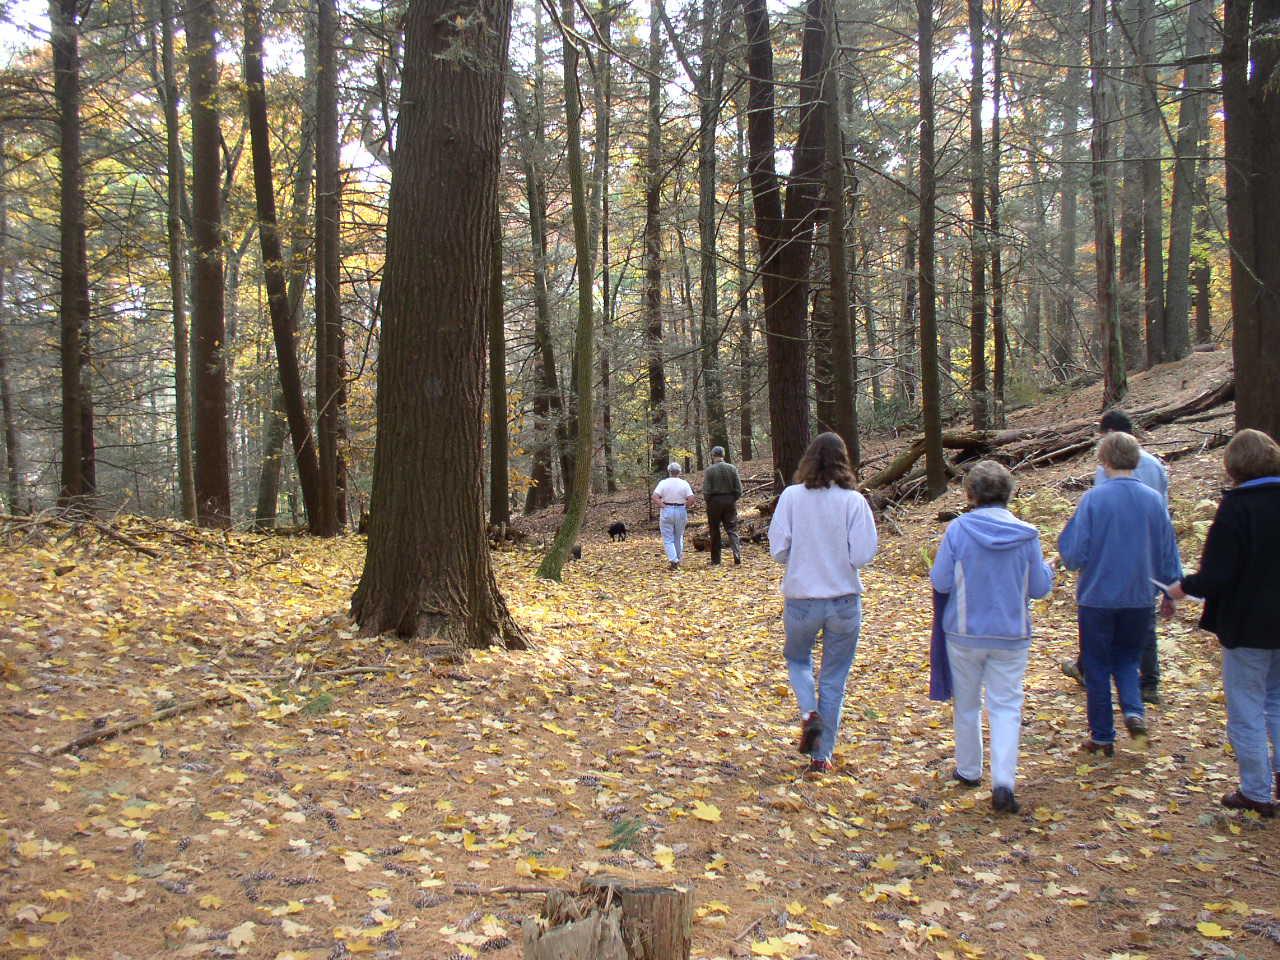 People walking in the Sears Land woods